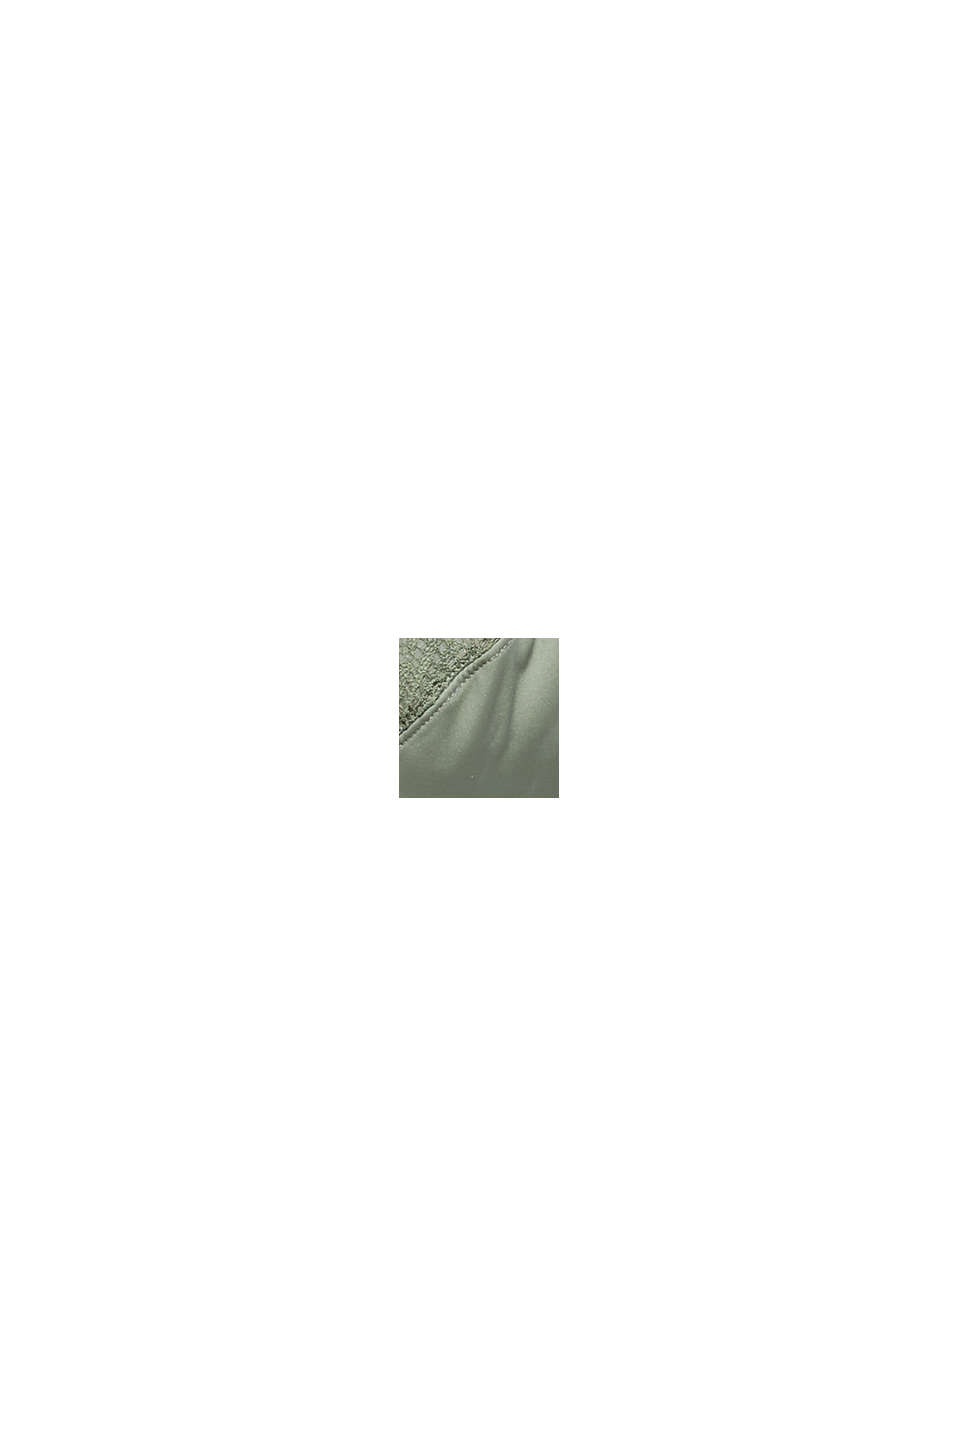 Sujetador de aros sin relleno con encaje, LIGHT KHAKI, swatch